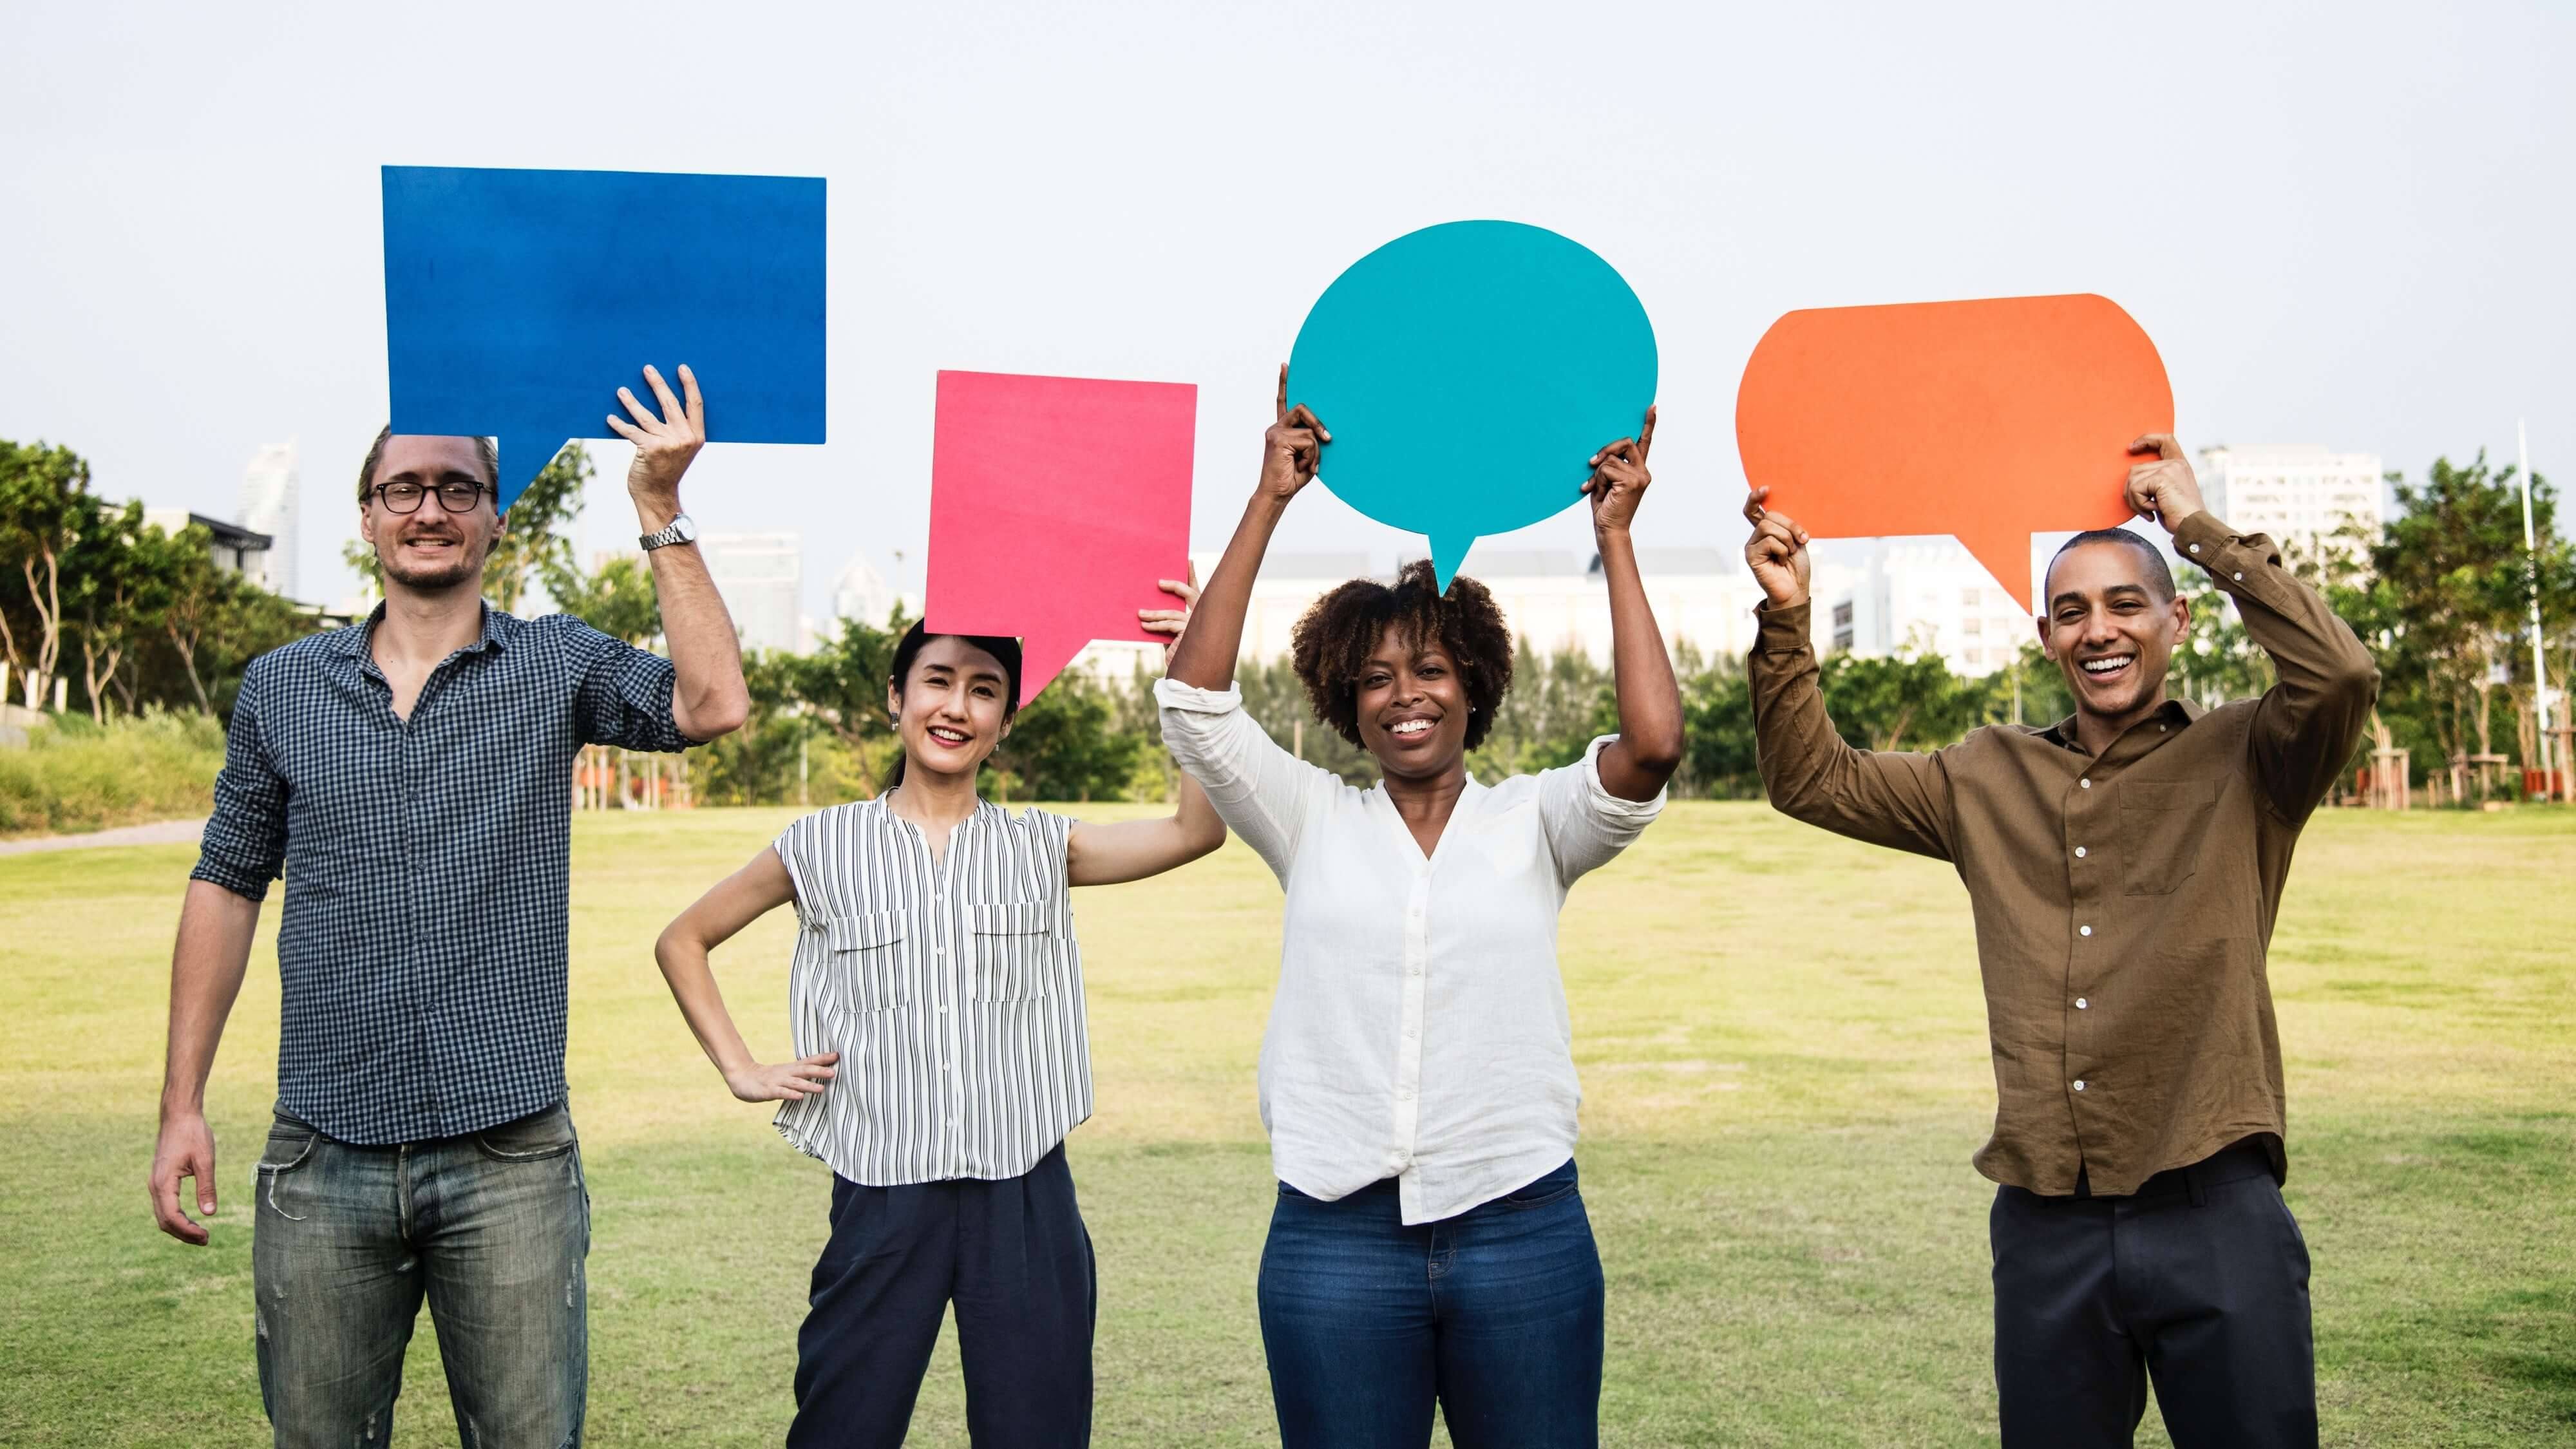 LIVEKINDLY Launches Vegan Volunteer Jobs with New Internship Program